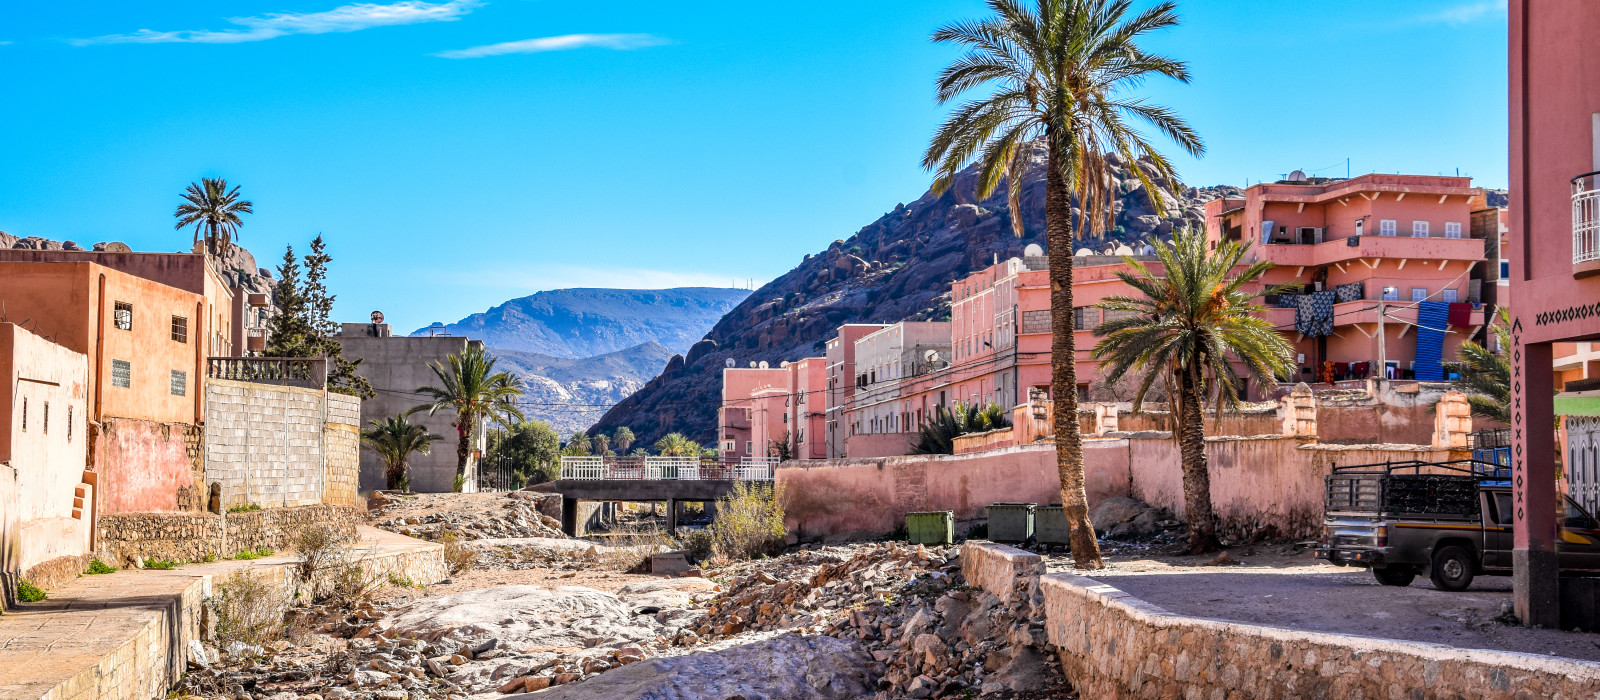 Hotel Saint Antoine Tafoukt Marokko